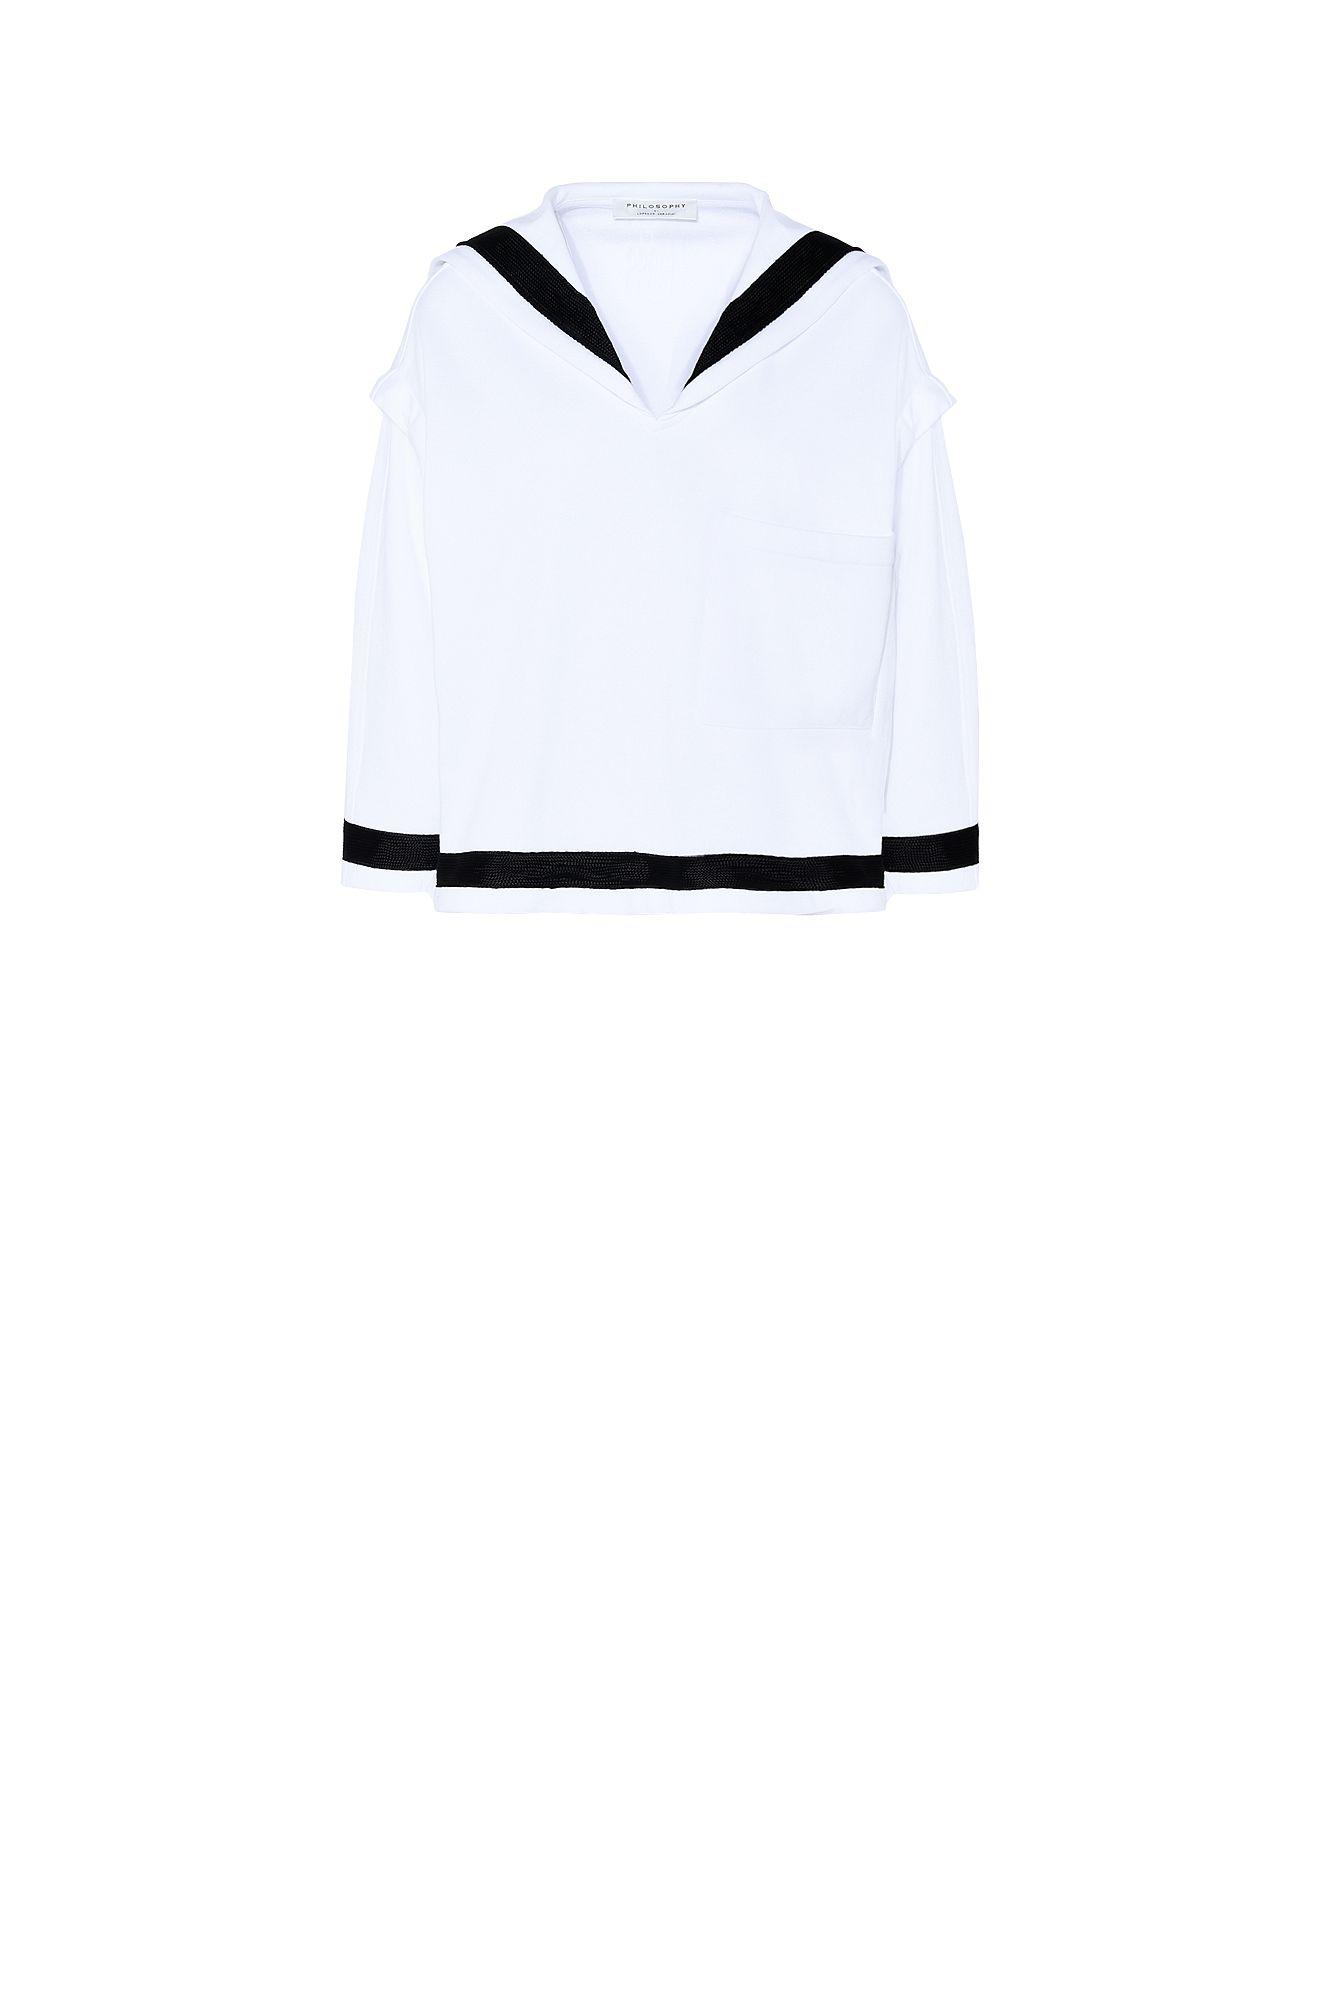 Sailor-style Philosophy sweatshirt